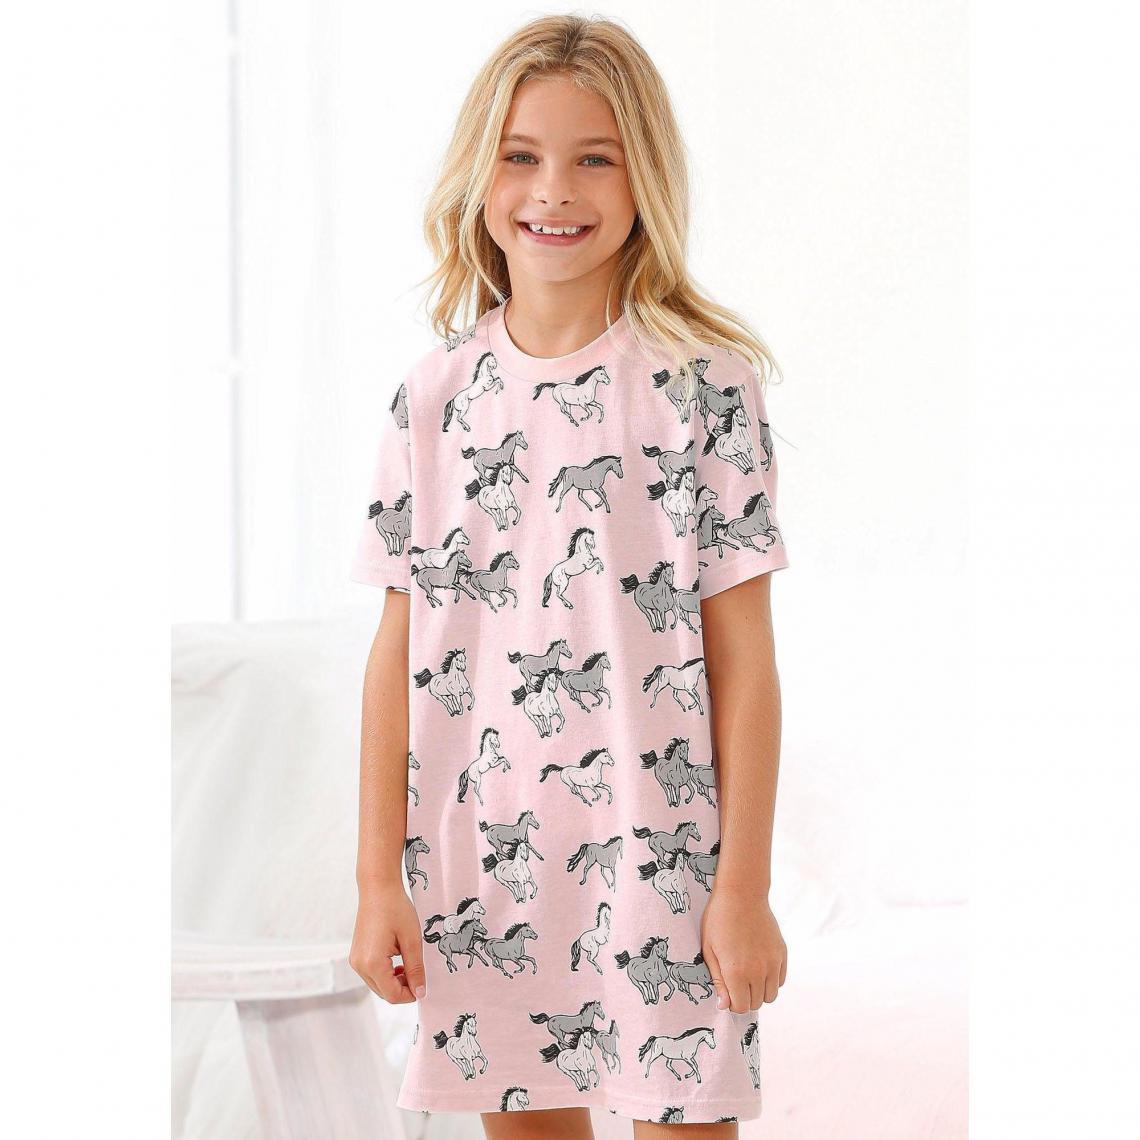 06caa10019fc3 Petite Fleur Mädchen Nachthemd mit Allover Pferde-Print - Rose Petite Fleur  Enfant